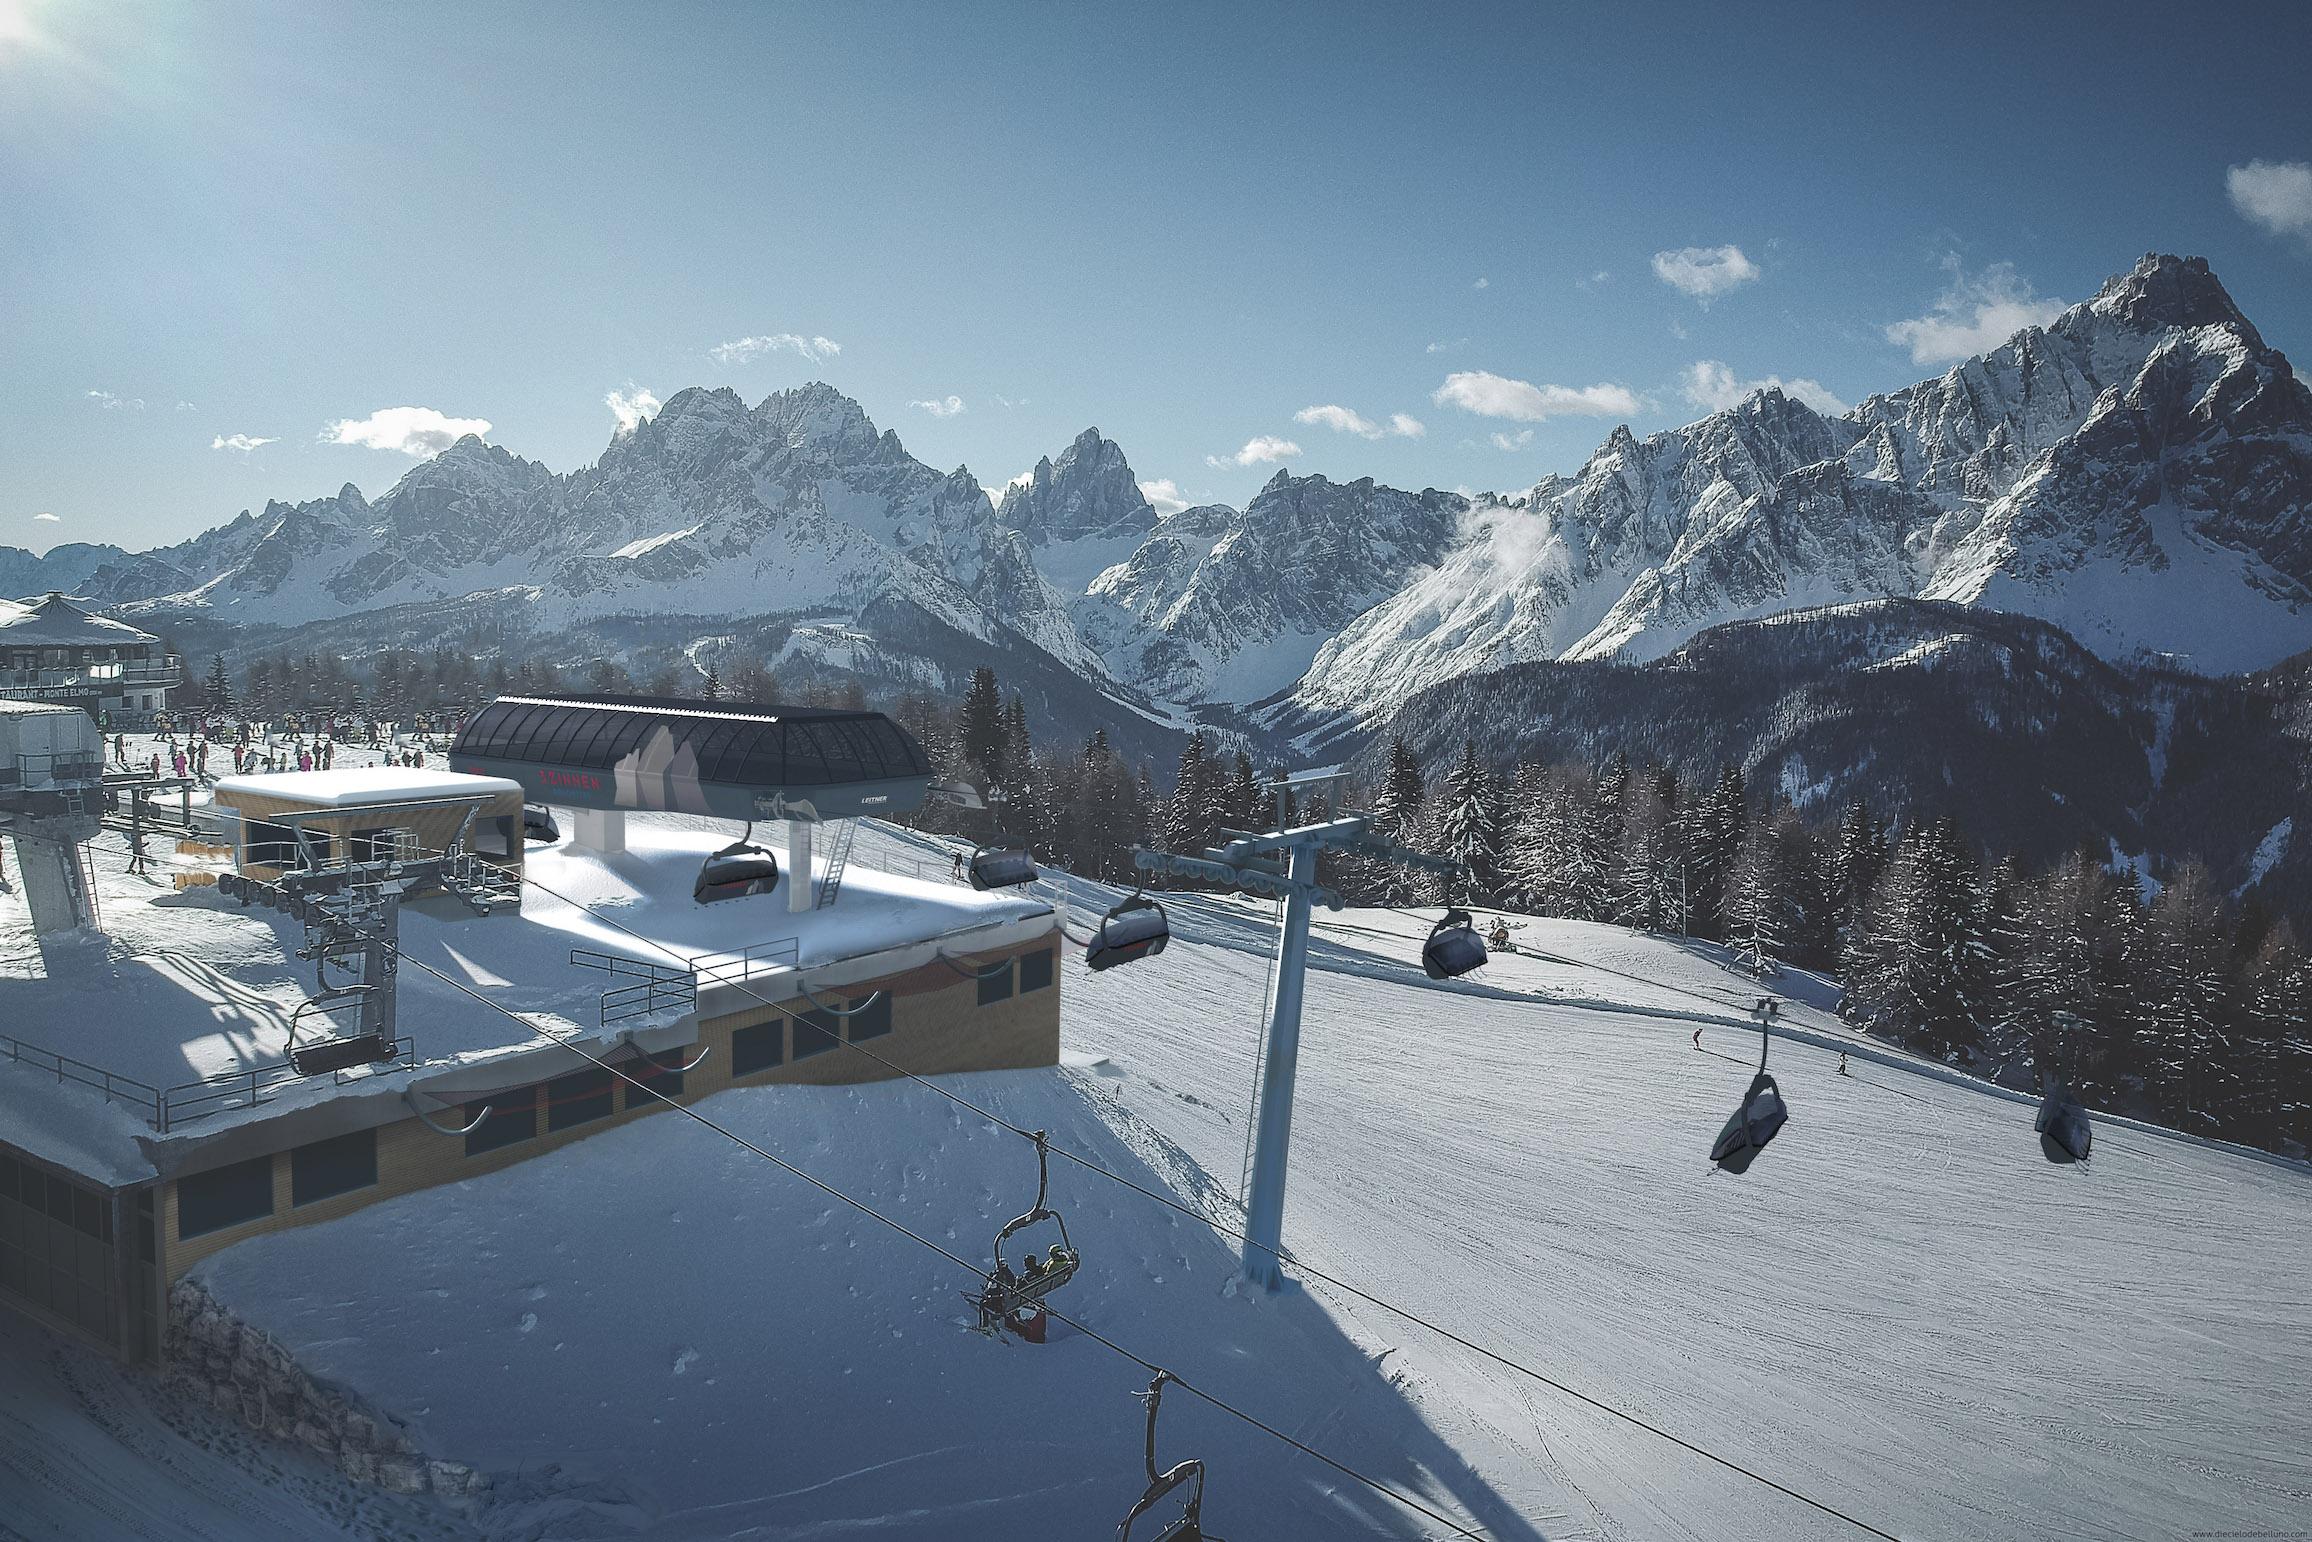 Dolomiti Superski_3 Zinnen Dolomiten_New chairlift Mittelstation Helm